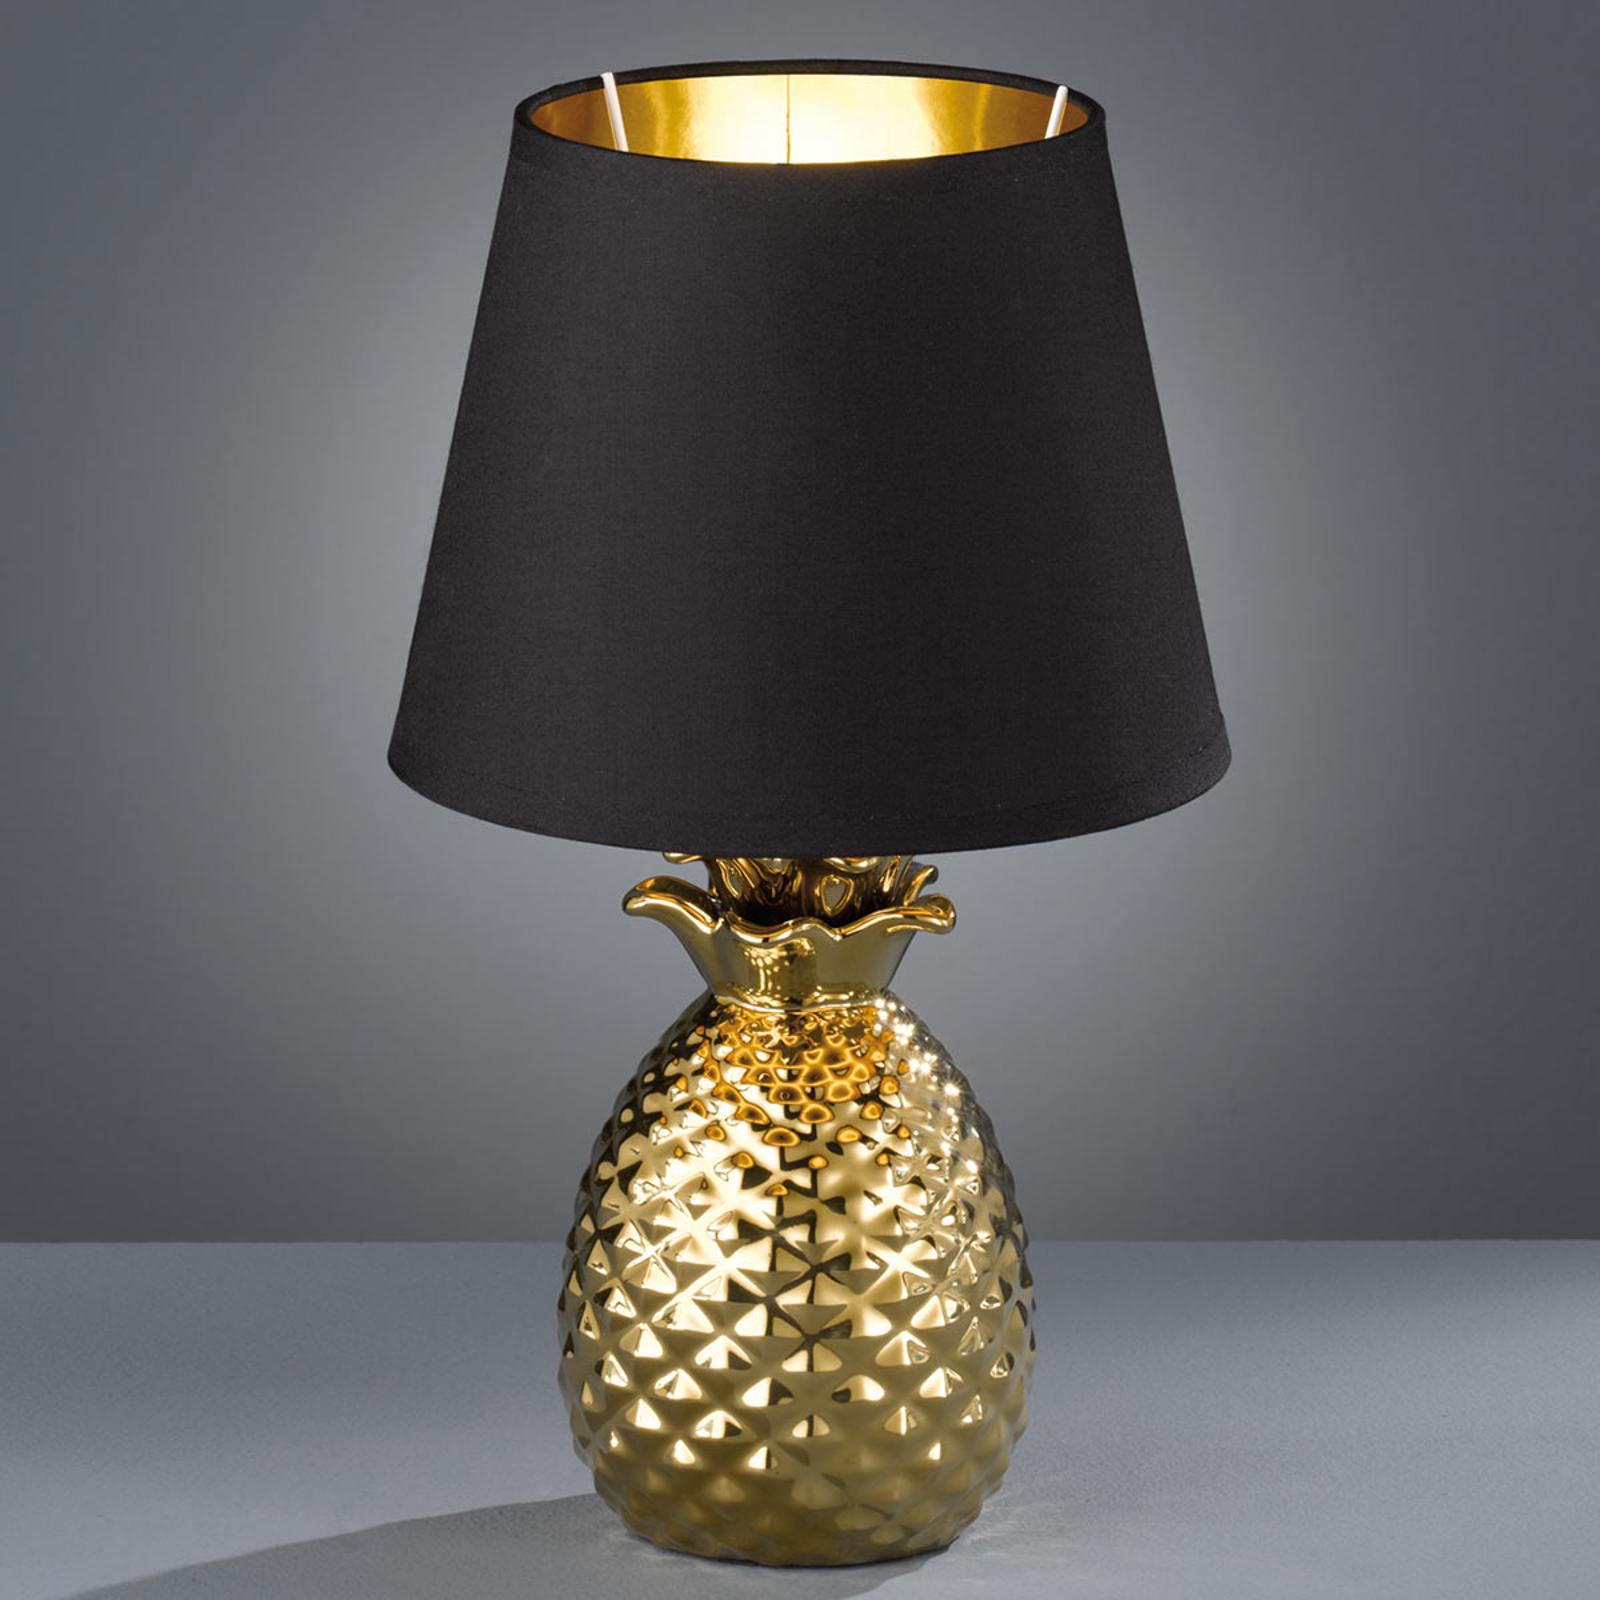 Edle Keramik-Tischlampe Pineapple in Gold-Schwarz